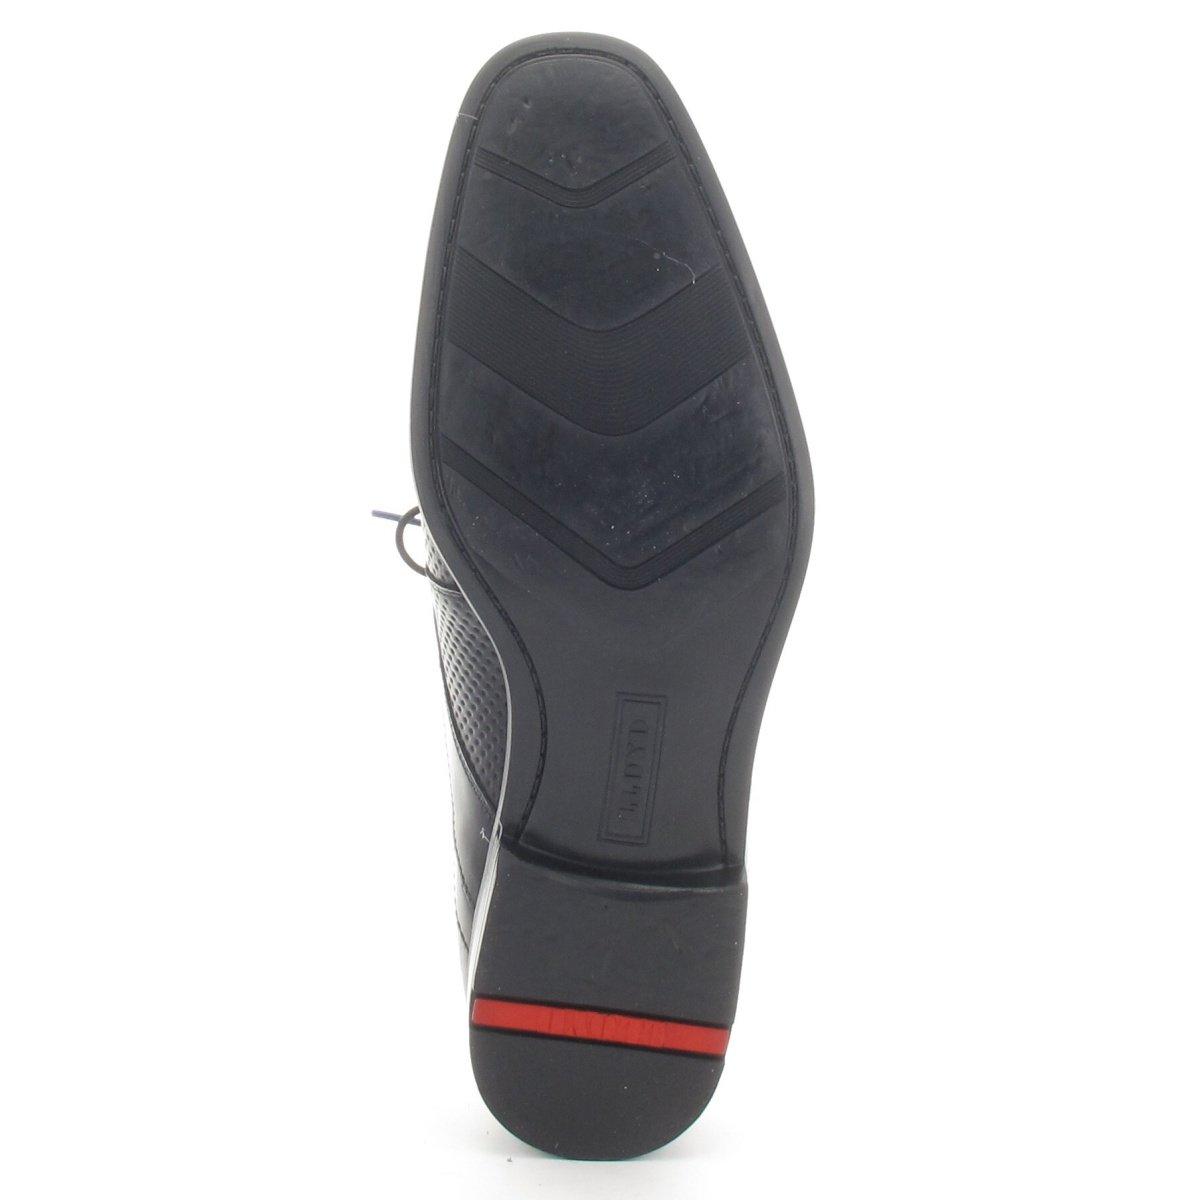 LLOYD Kalbleder 17-049-30 DARION - Business Schnürschuh - Kalbleder LLOYD schwarz - Gummisohle Grau 1a49e0